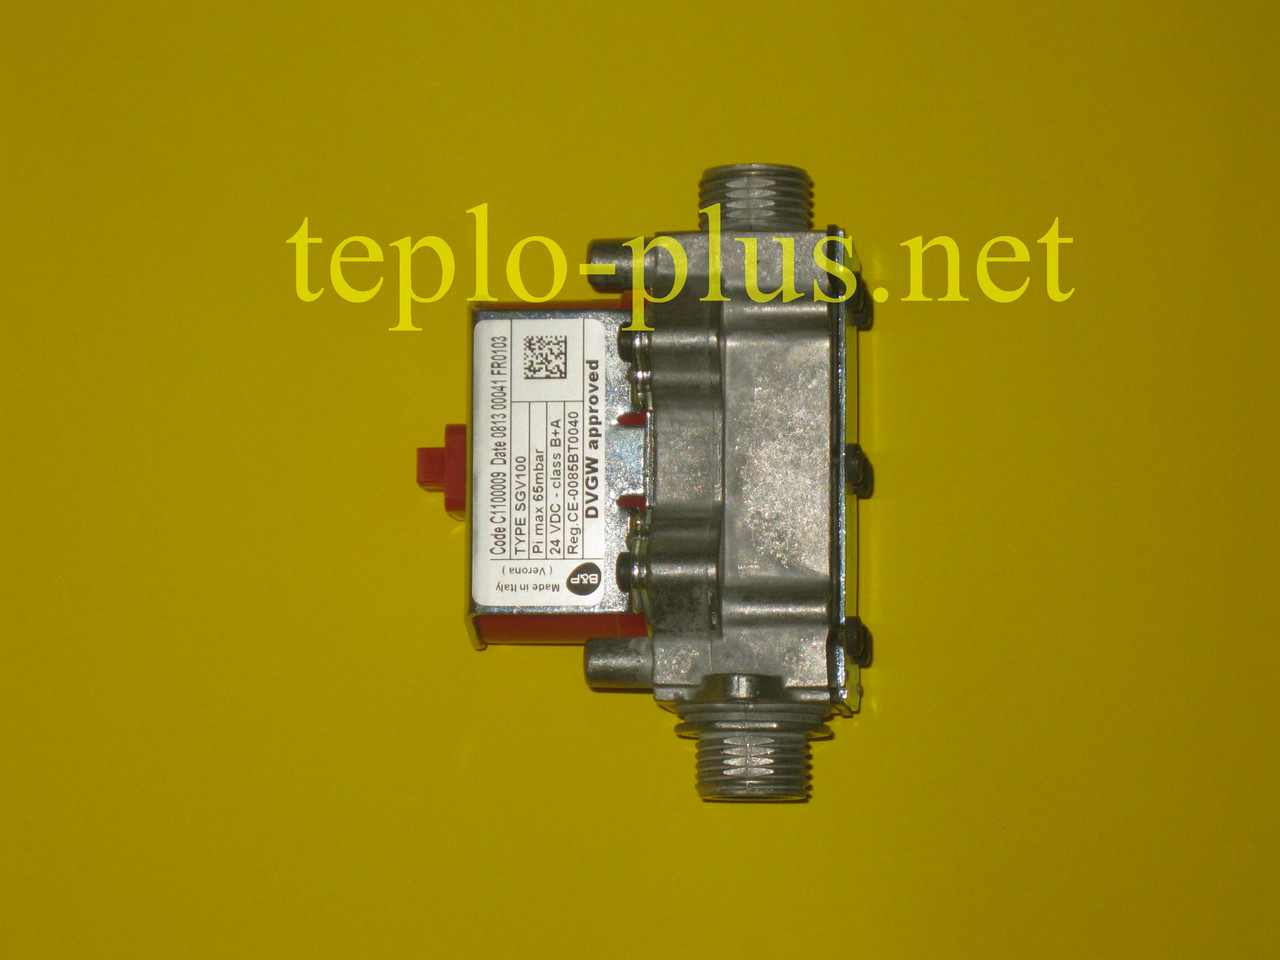 Газовый клапан 39841320 Ferroli Domiproject D, FerEasy D, Domitech D, Divatech C24D, фото 3